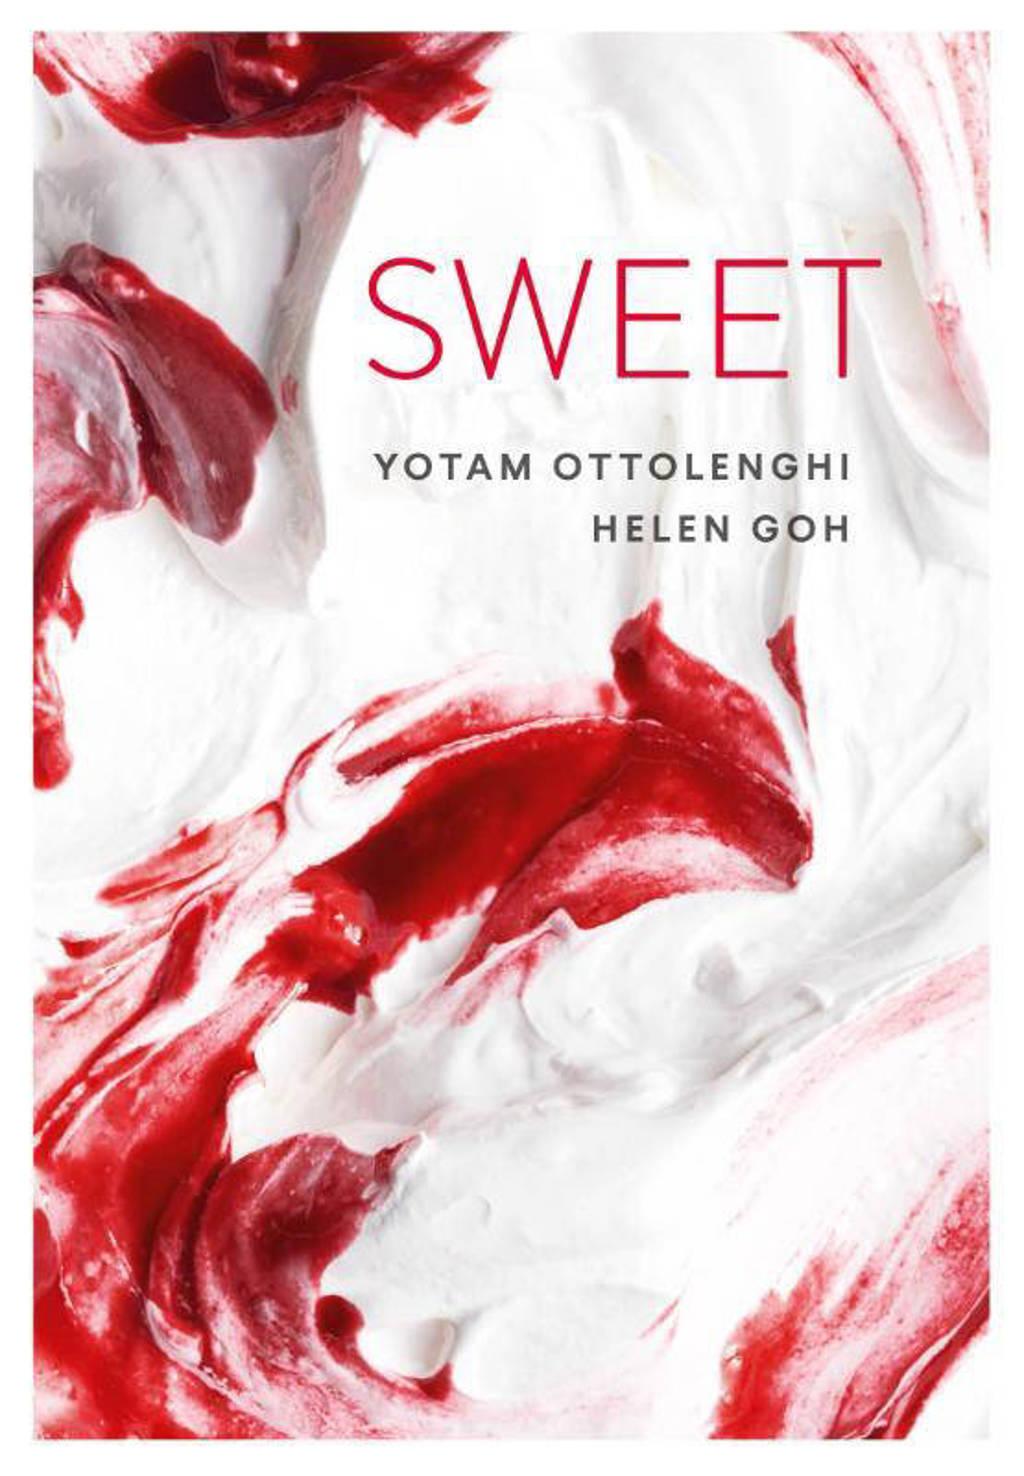 Sweet - Yotam Ottolenghi en Helen Goh